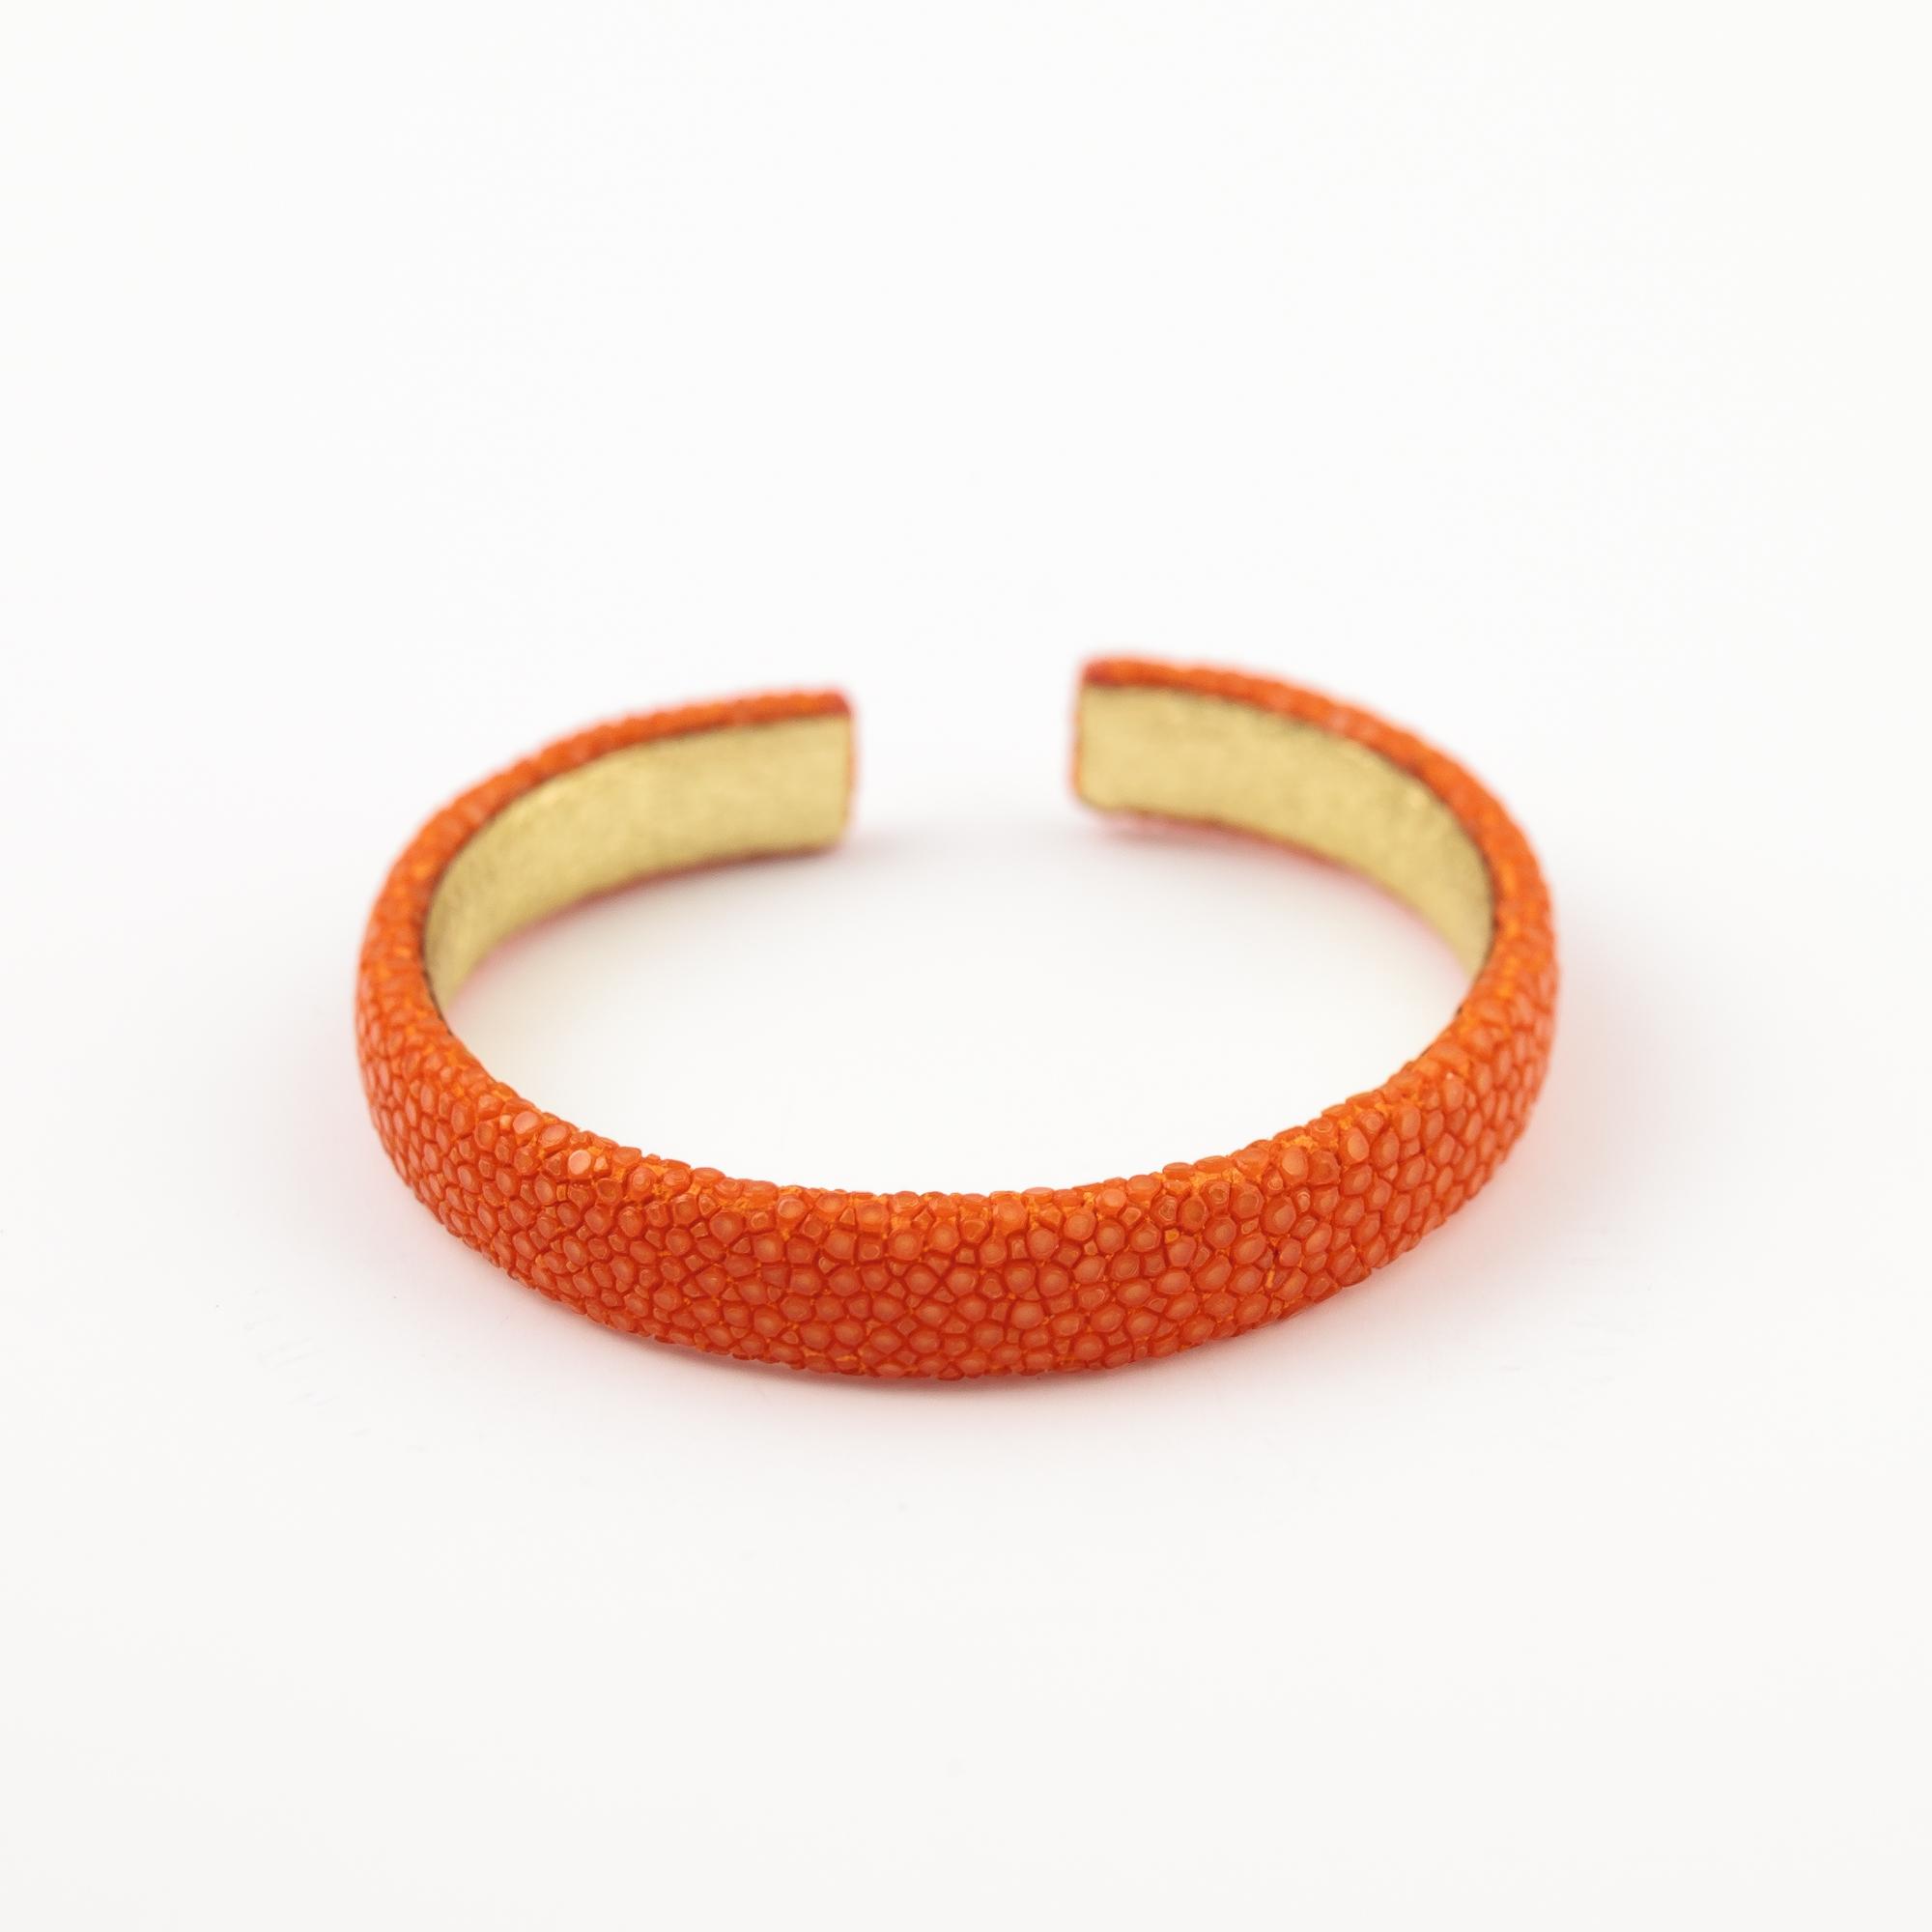 tresor-by-flore-galuchat-bracelet-simplicite-small-mandarine-2